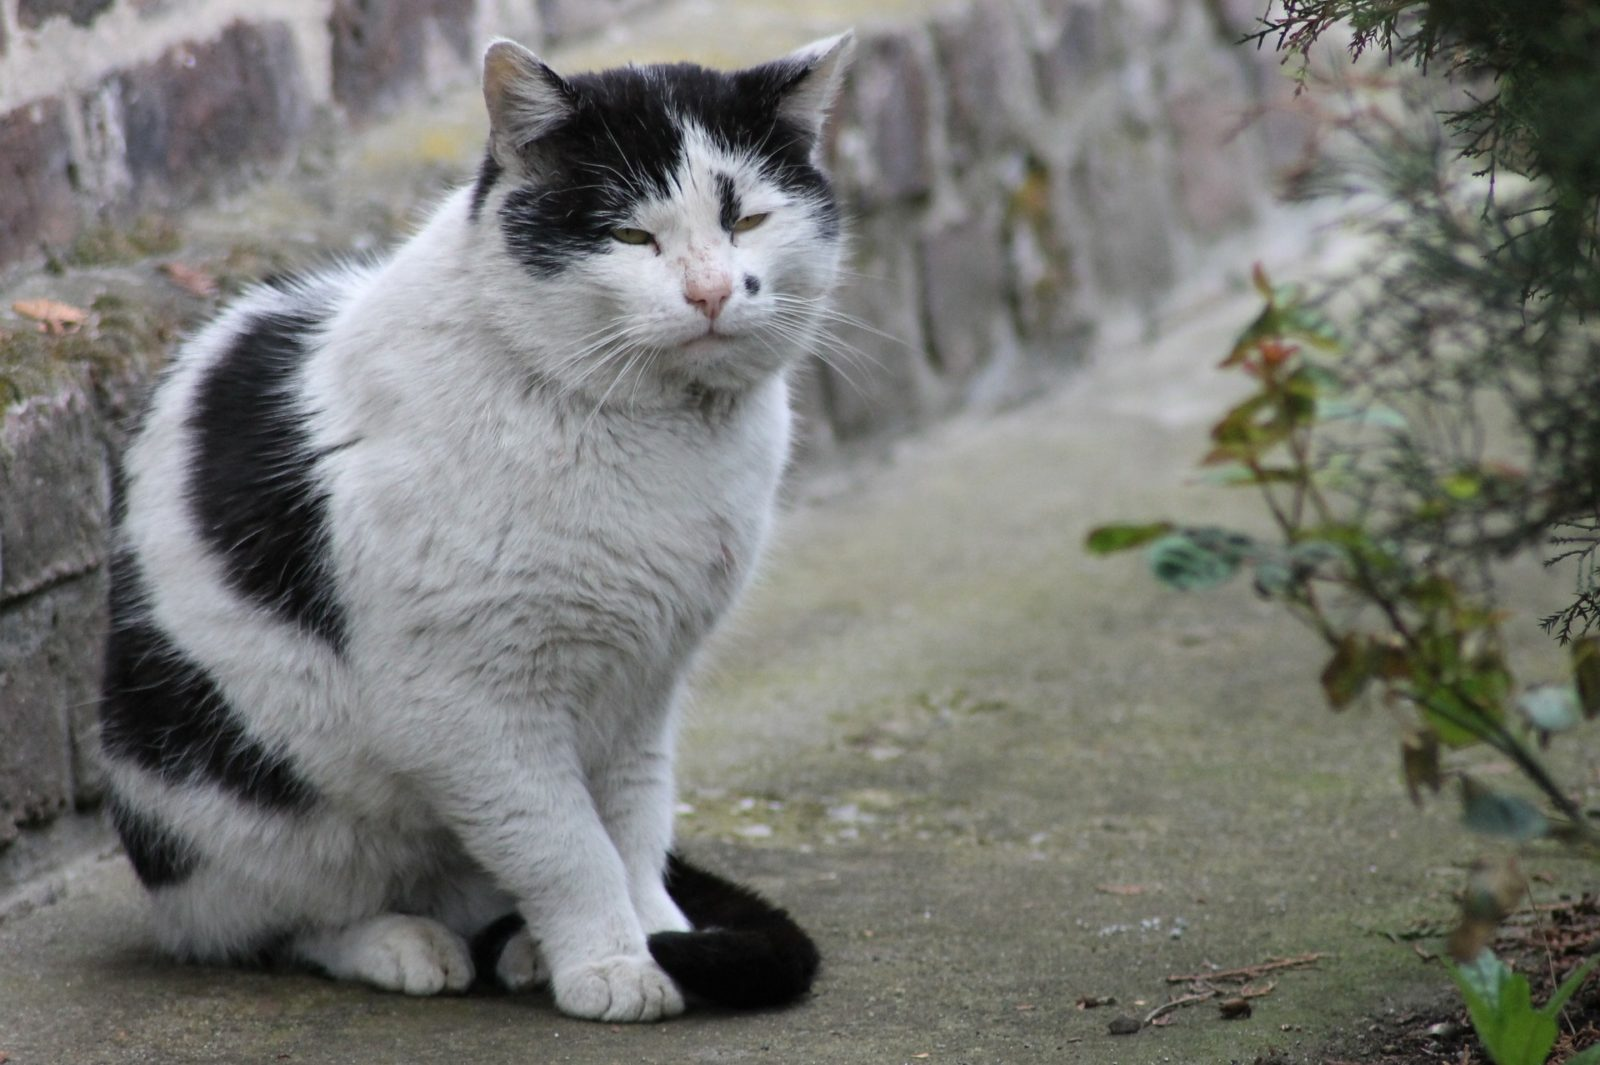 stary schorowany kot wfundacji